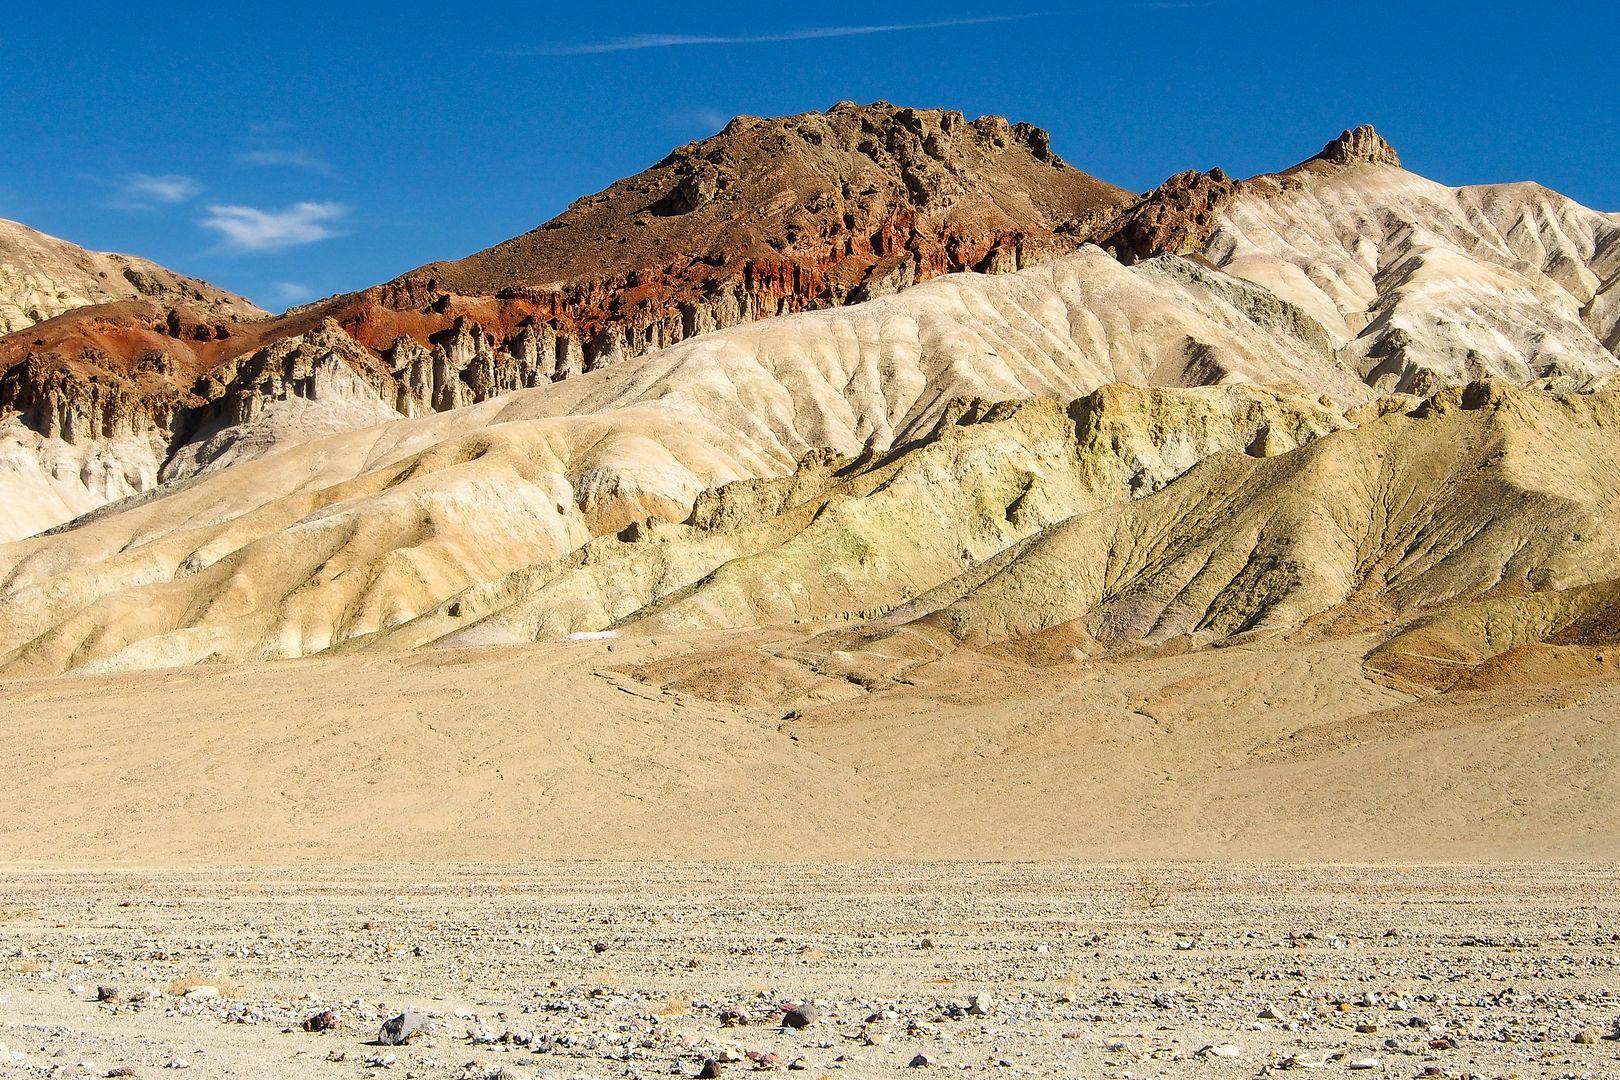 C'est vraiment désert... Deacutesert7_zps1c39da7b